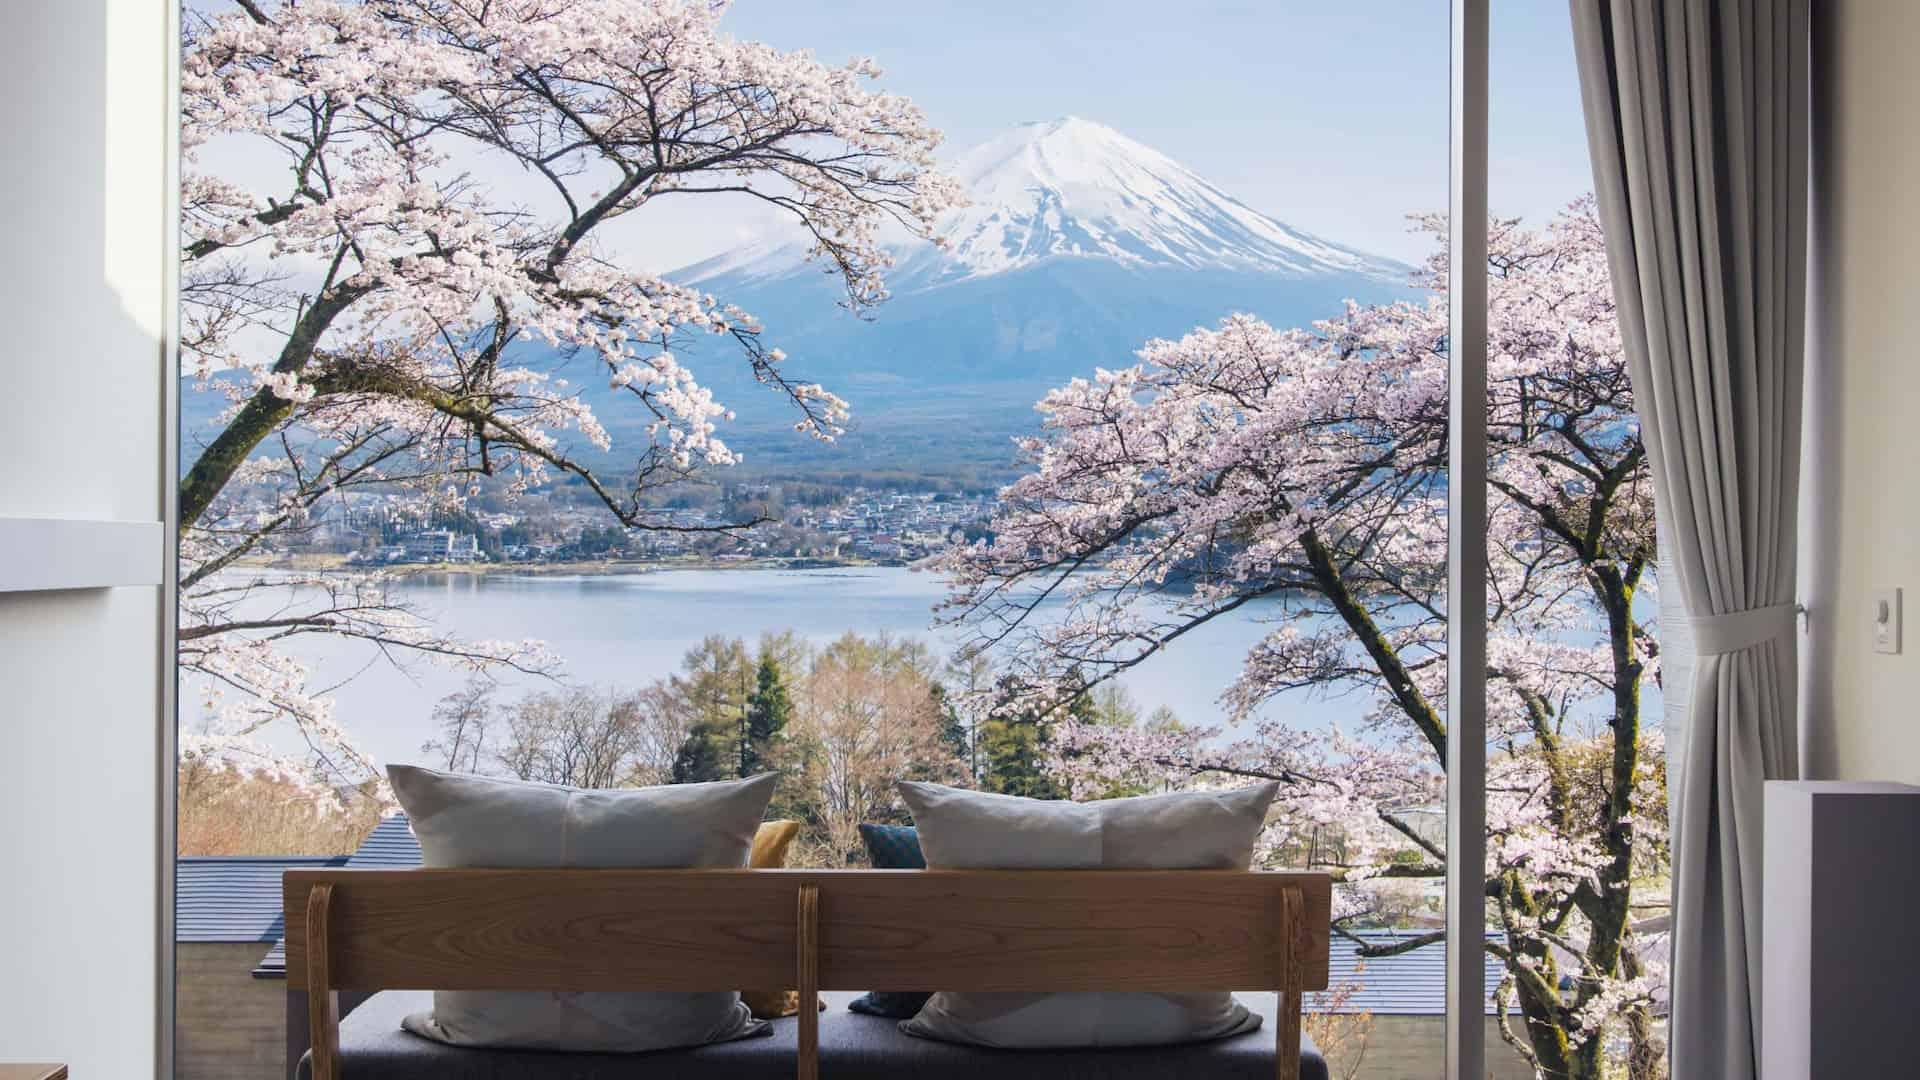 Design hotel Giappone hoshinoya fuji